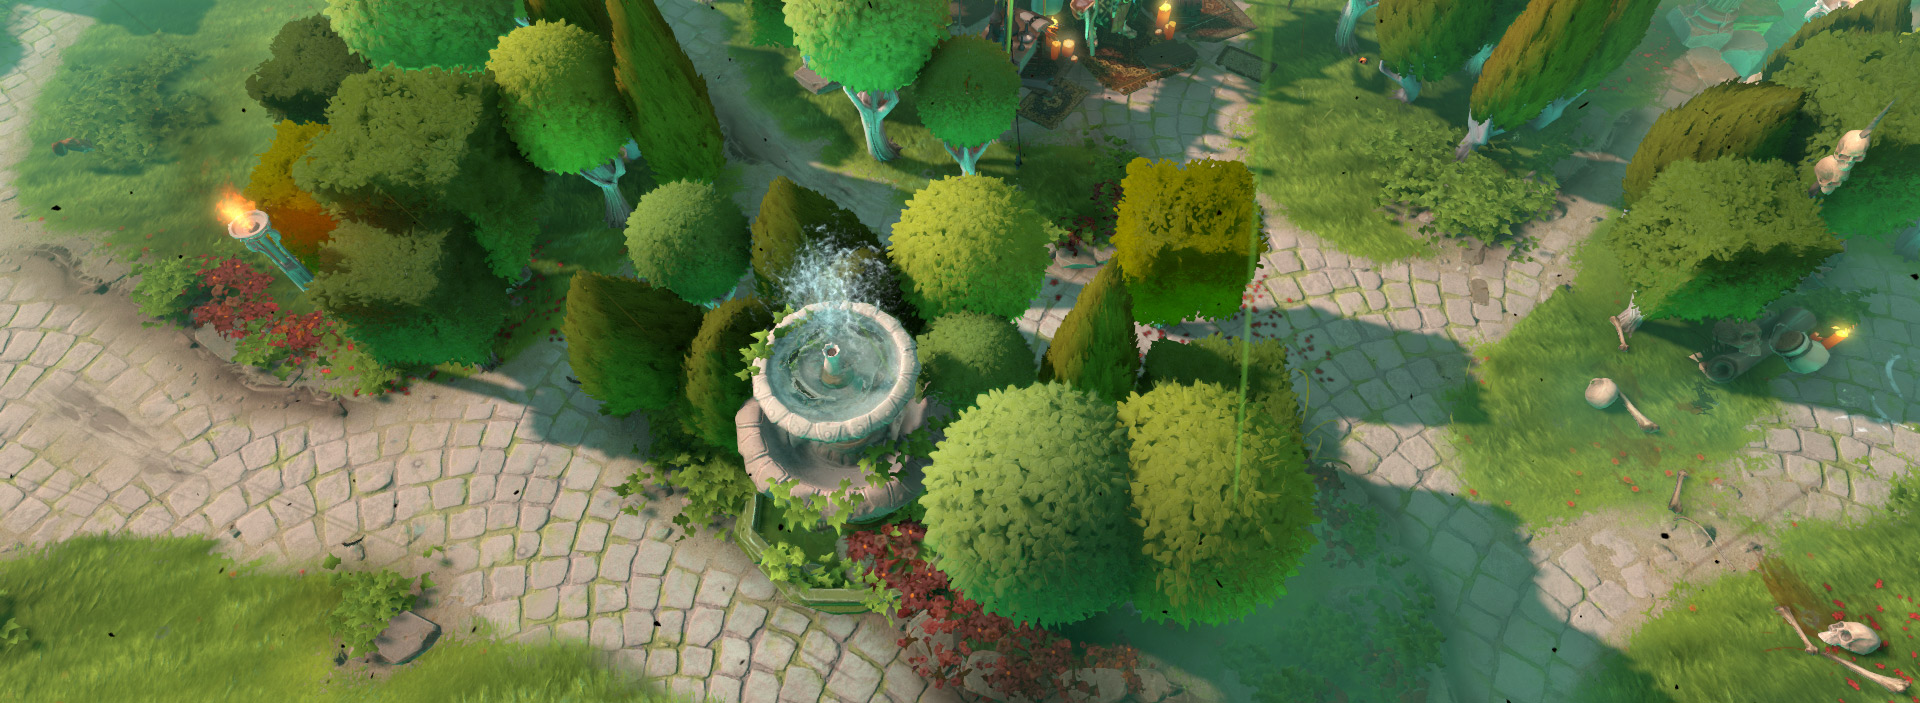 Immortal Gardens Weather Pestilence Preview 2.jpg